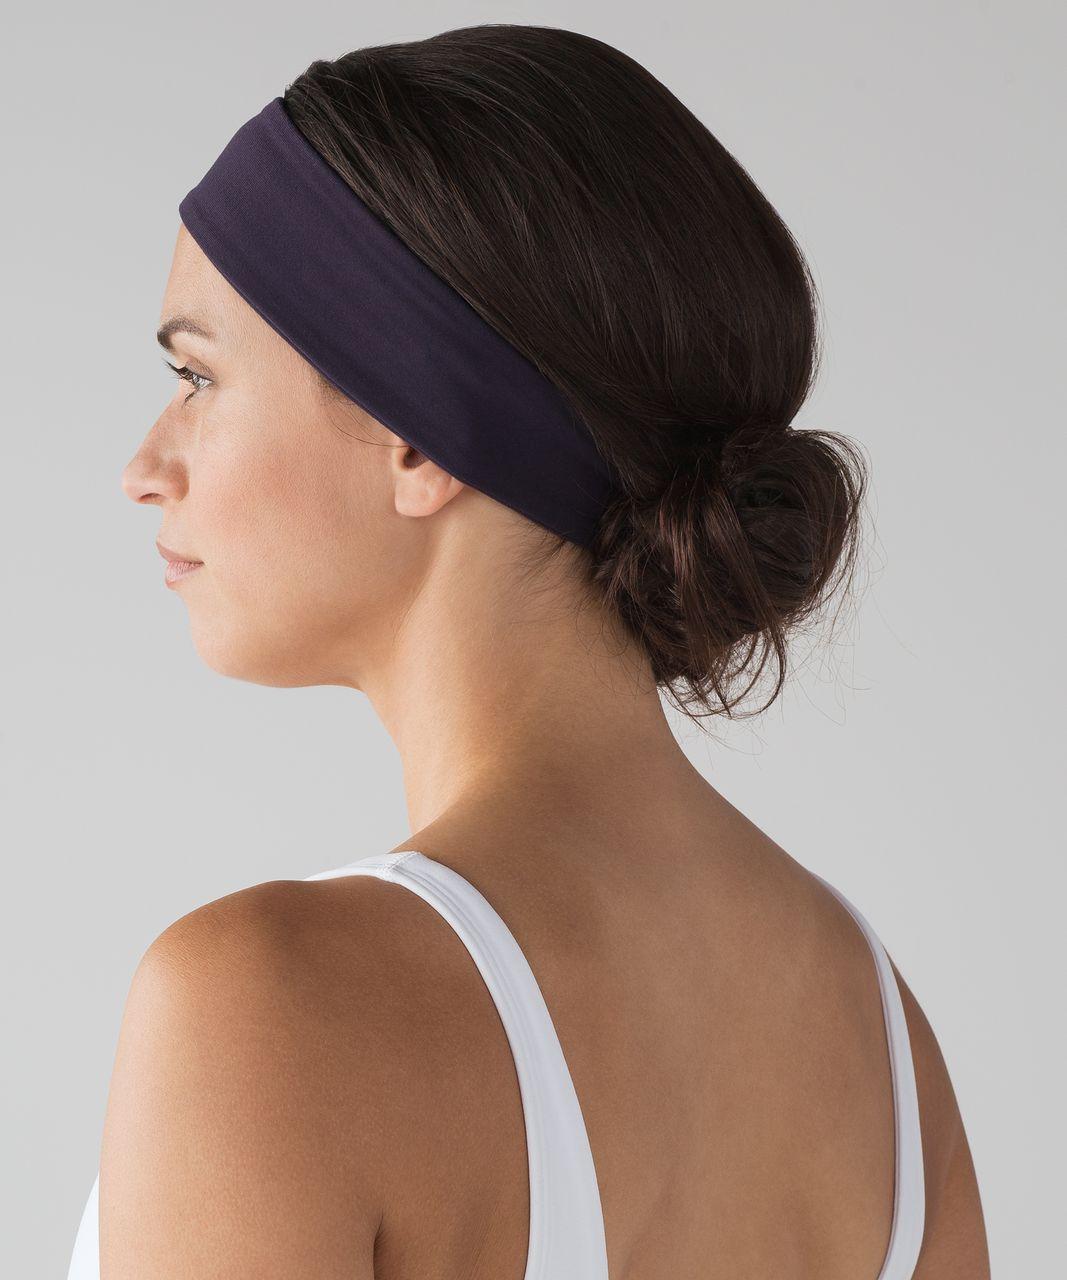 Lululemon Fly Away Tamer Headband II - Black Grape